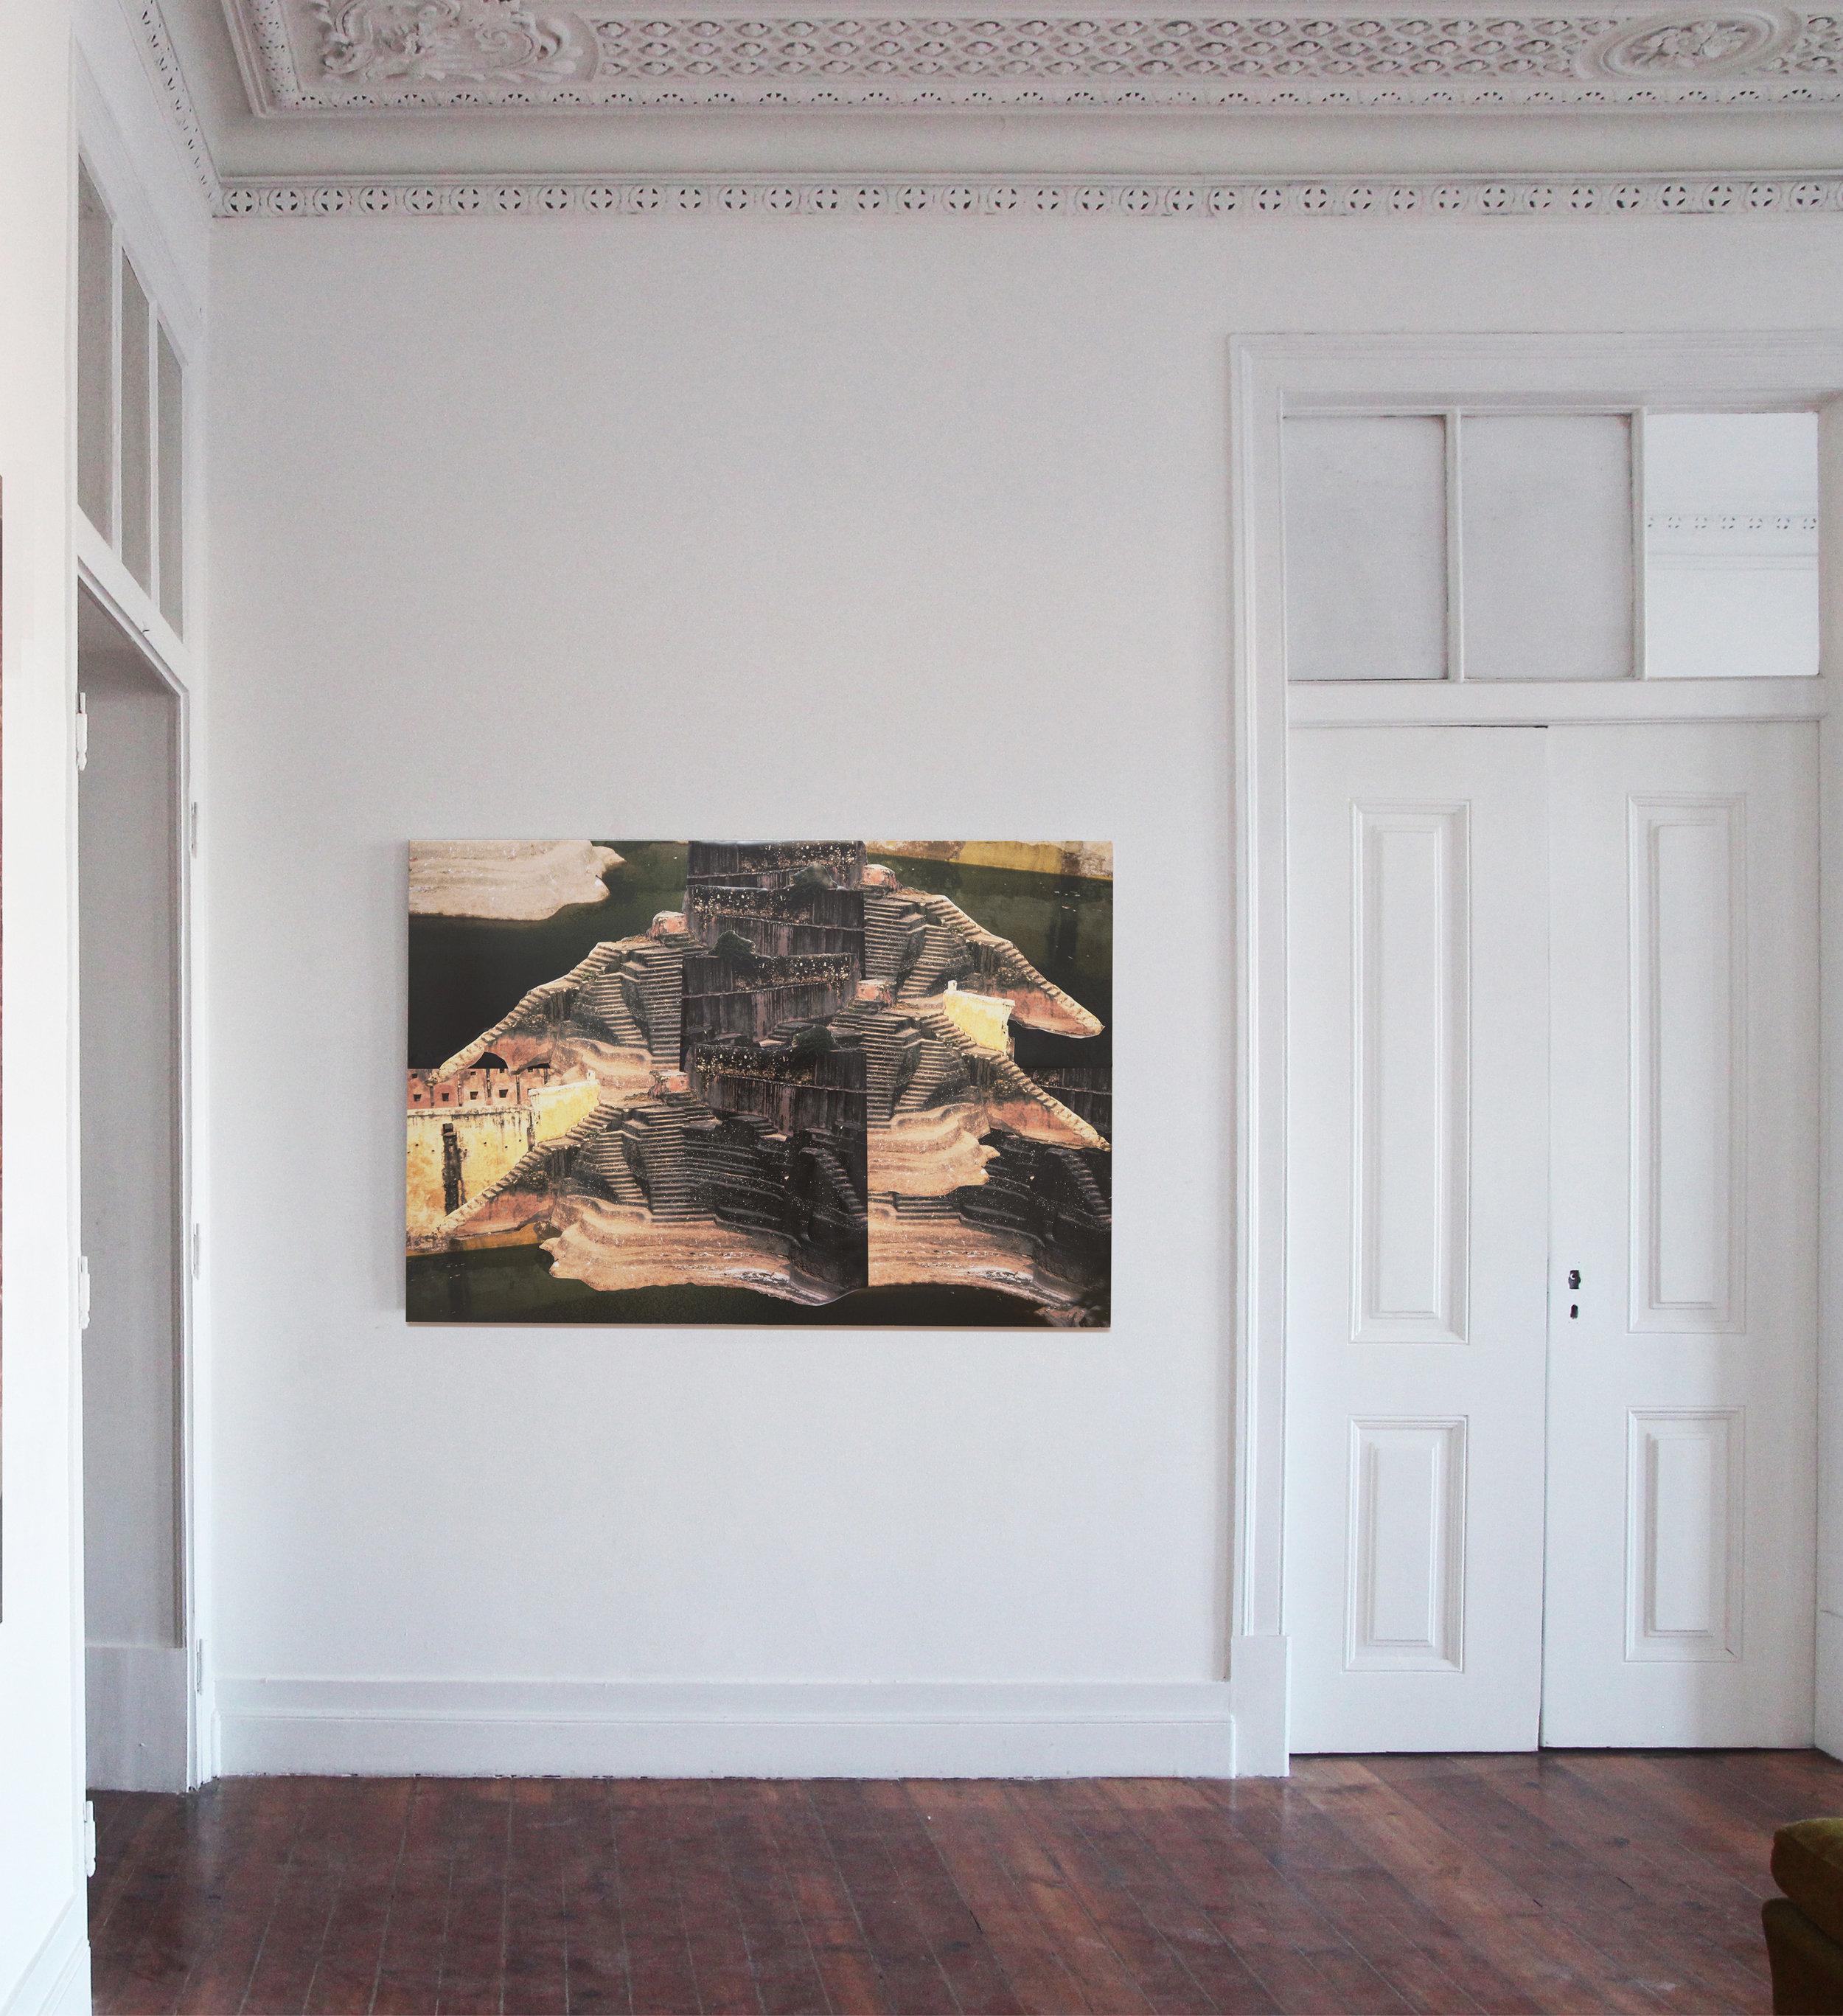 carolina-pimenta-overlayerd-deconstructing landscapes-06.jpg